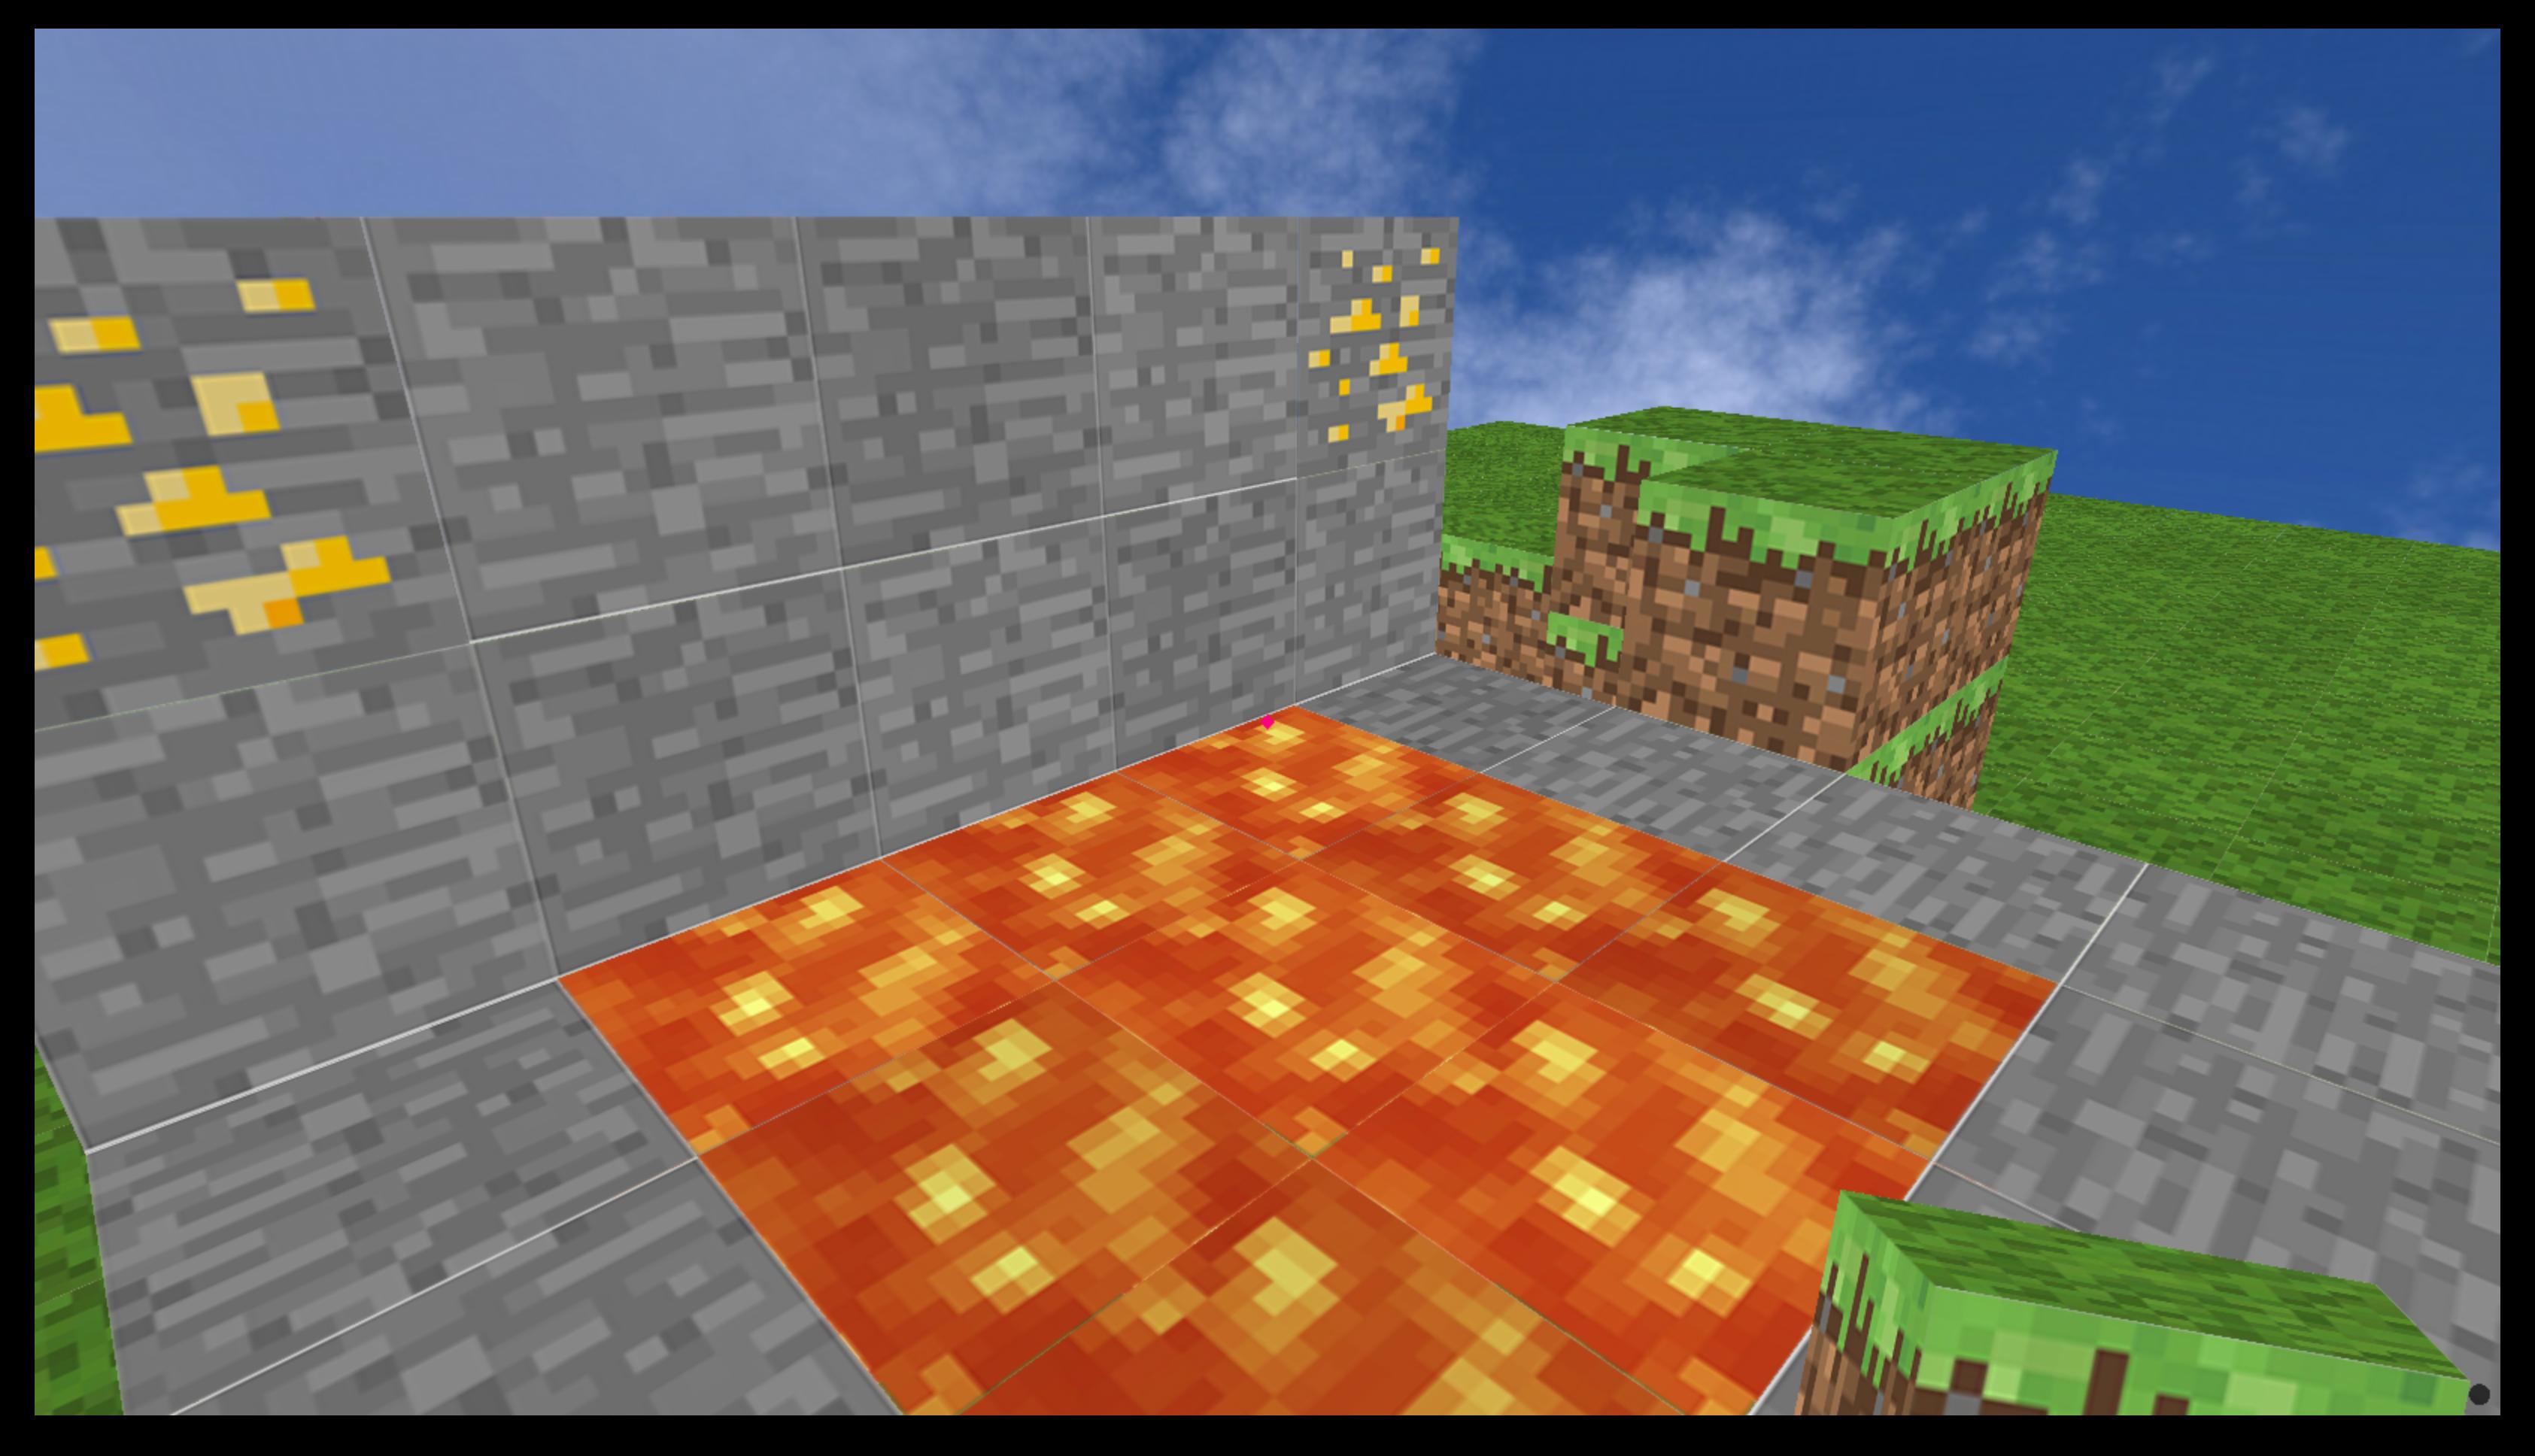 Minecraft clone using Python Ursina game engine!